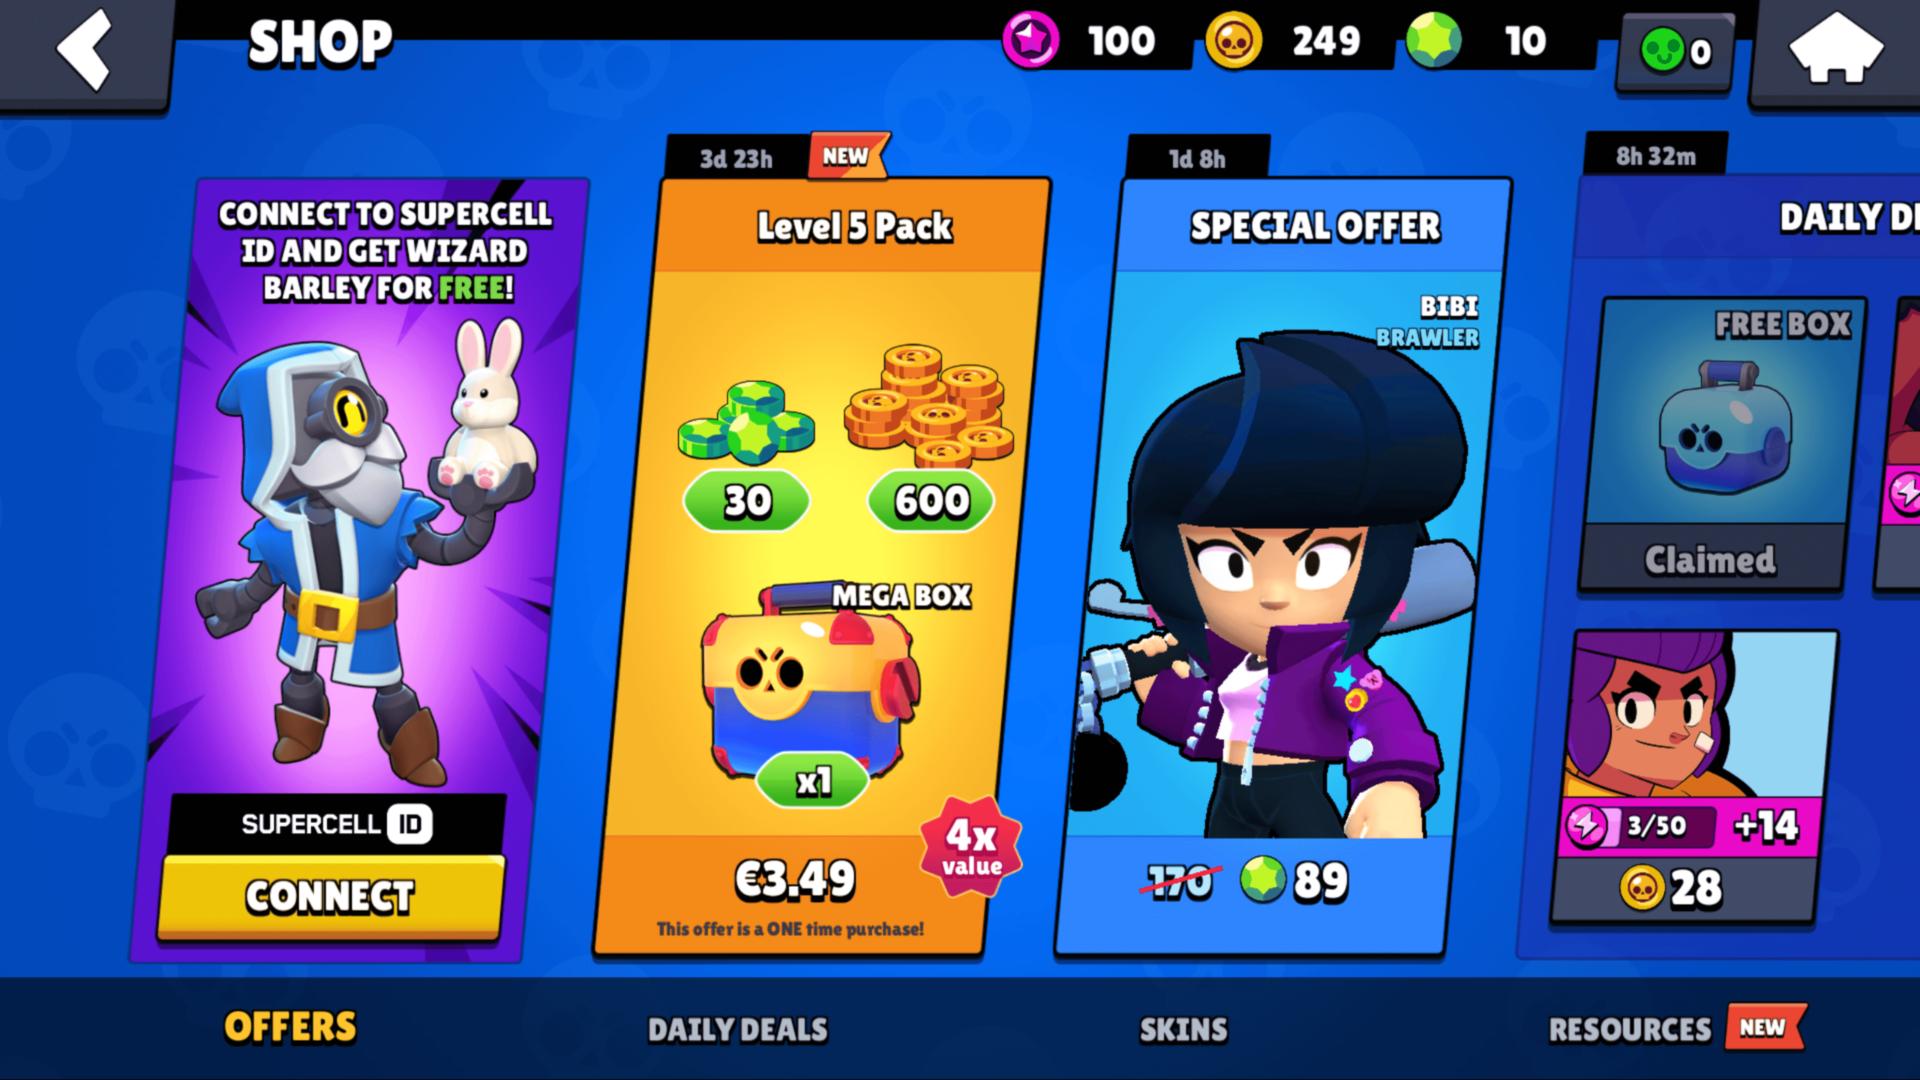 Shop screenshot of Brawl Stars video game interface.